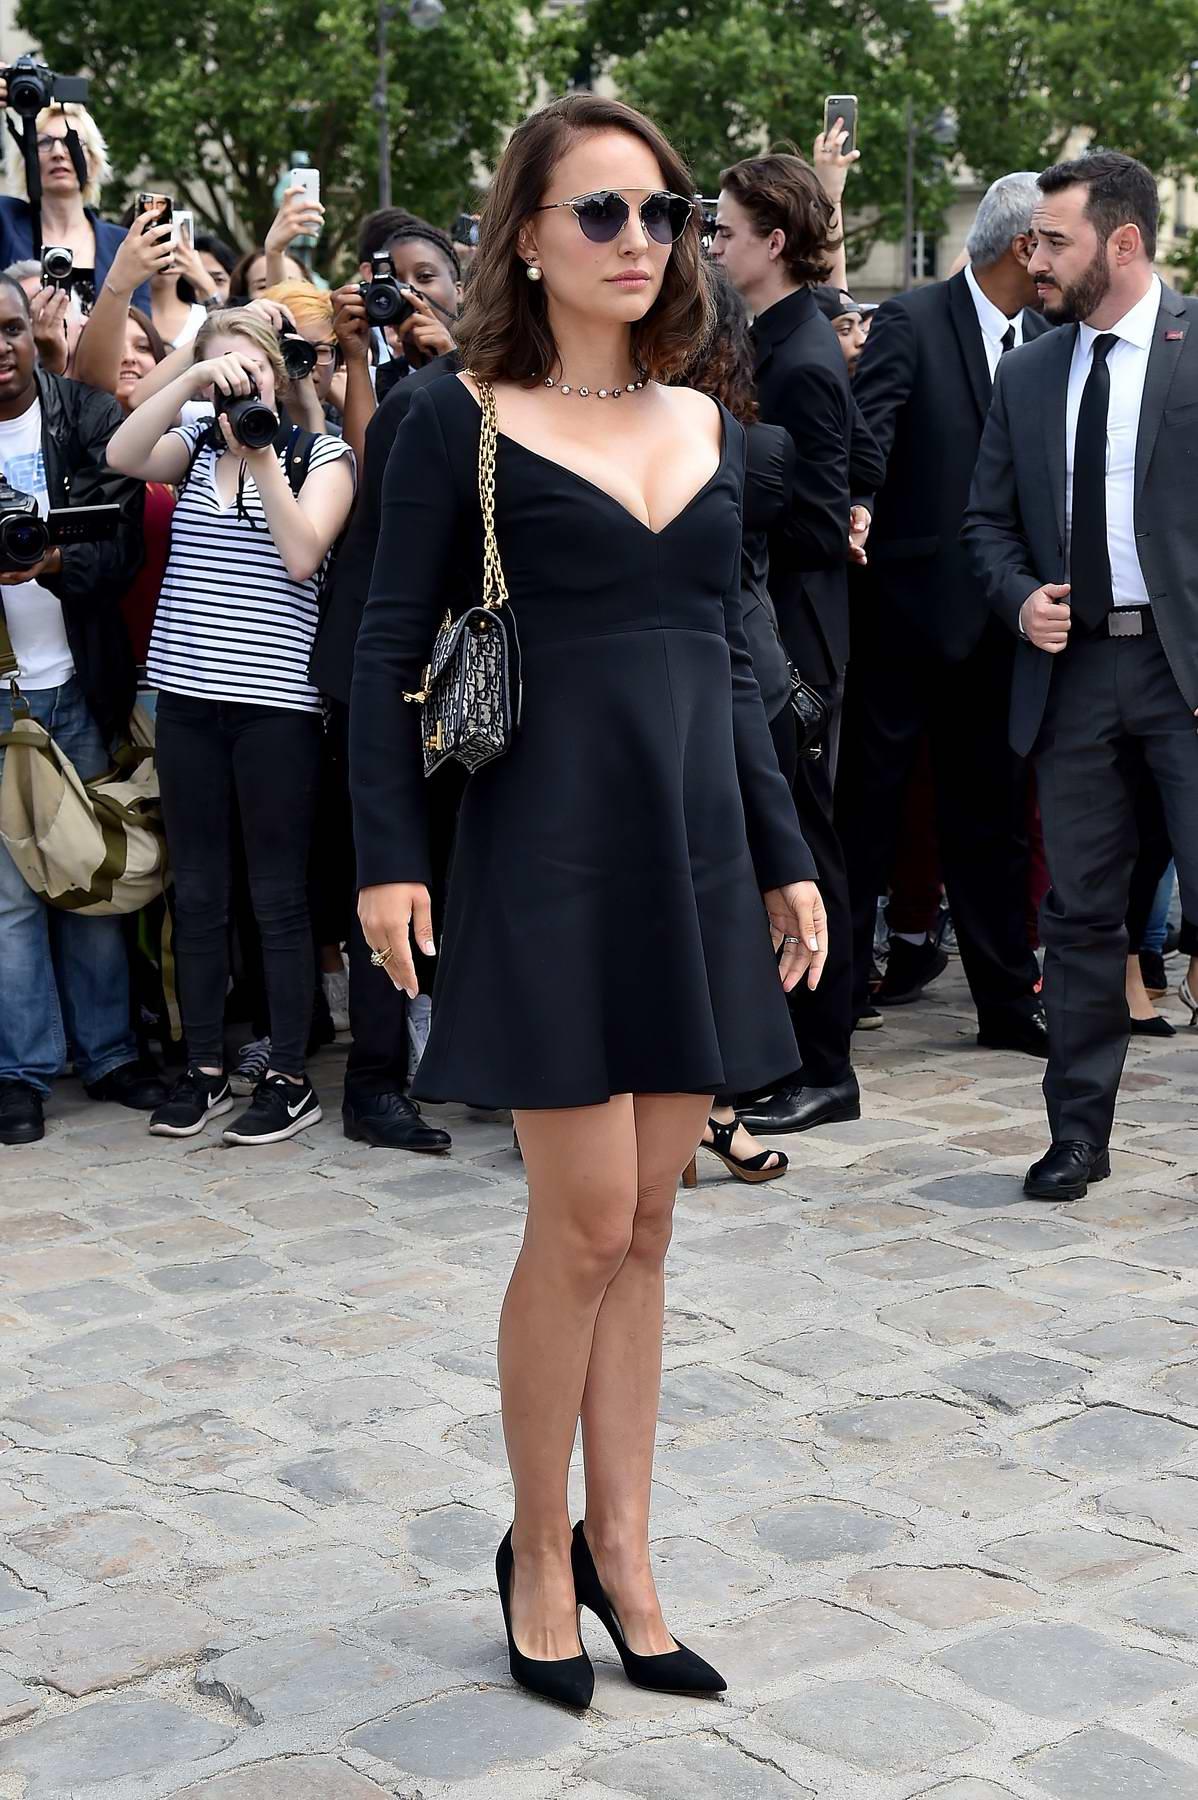 Natalie Portman at Christian Dior Haute Couture Fall/Winter 2017-2018 show at Haute Couture Paris Fashion Week in Paris